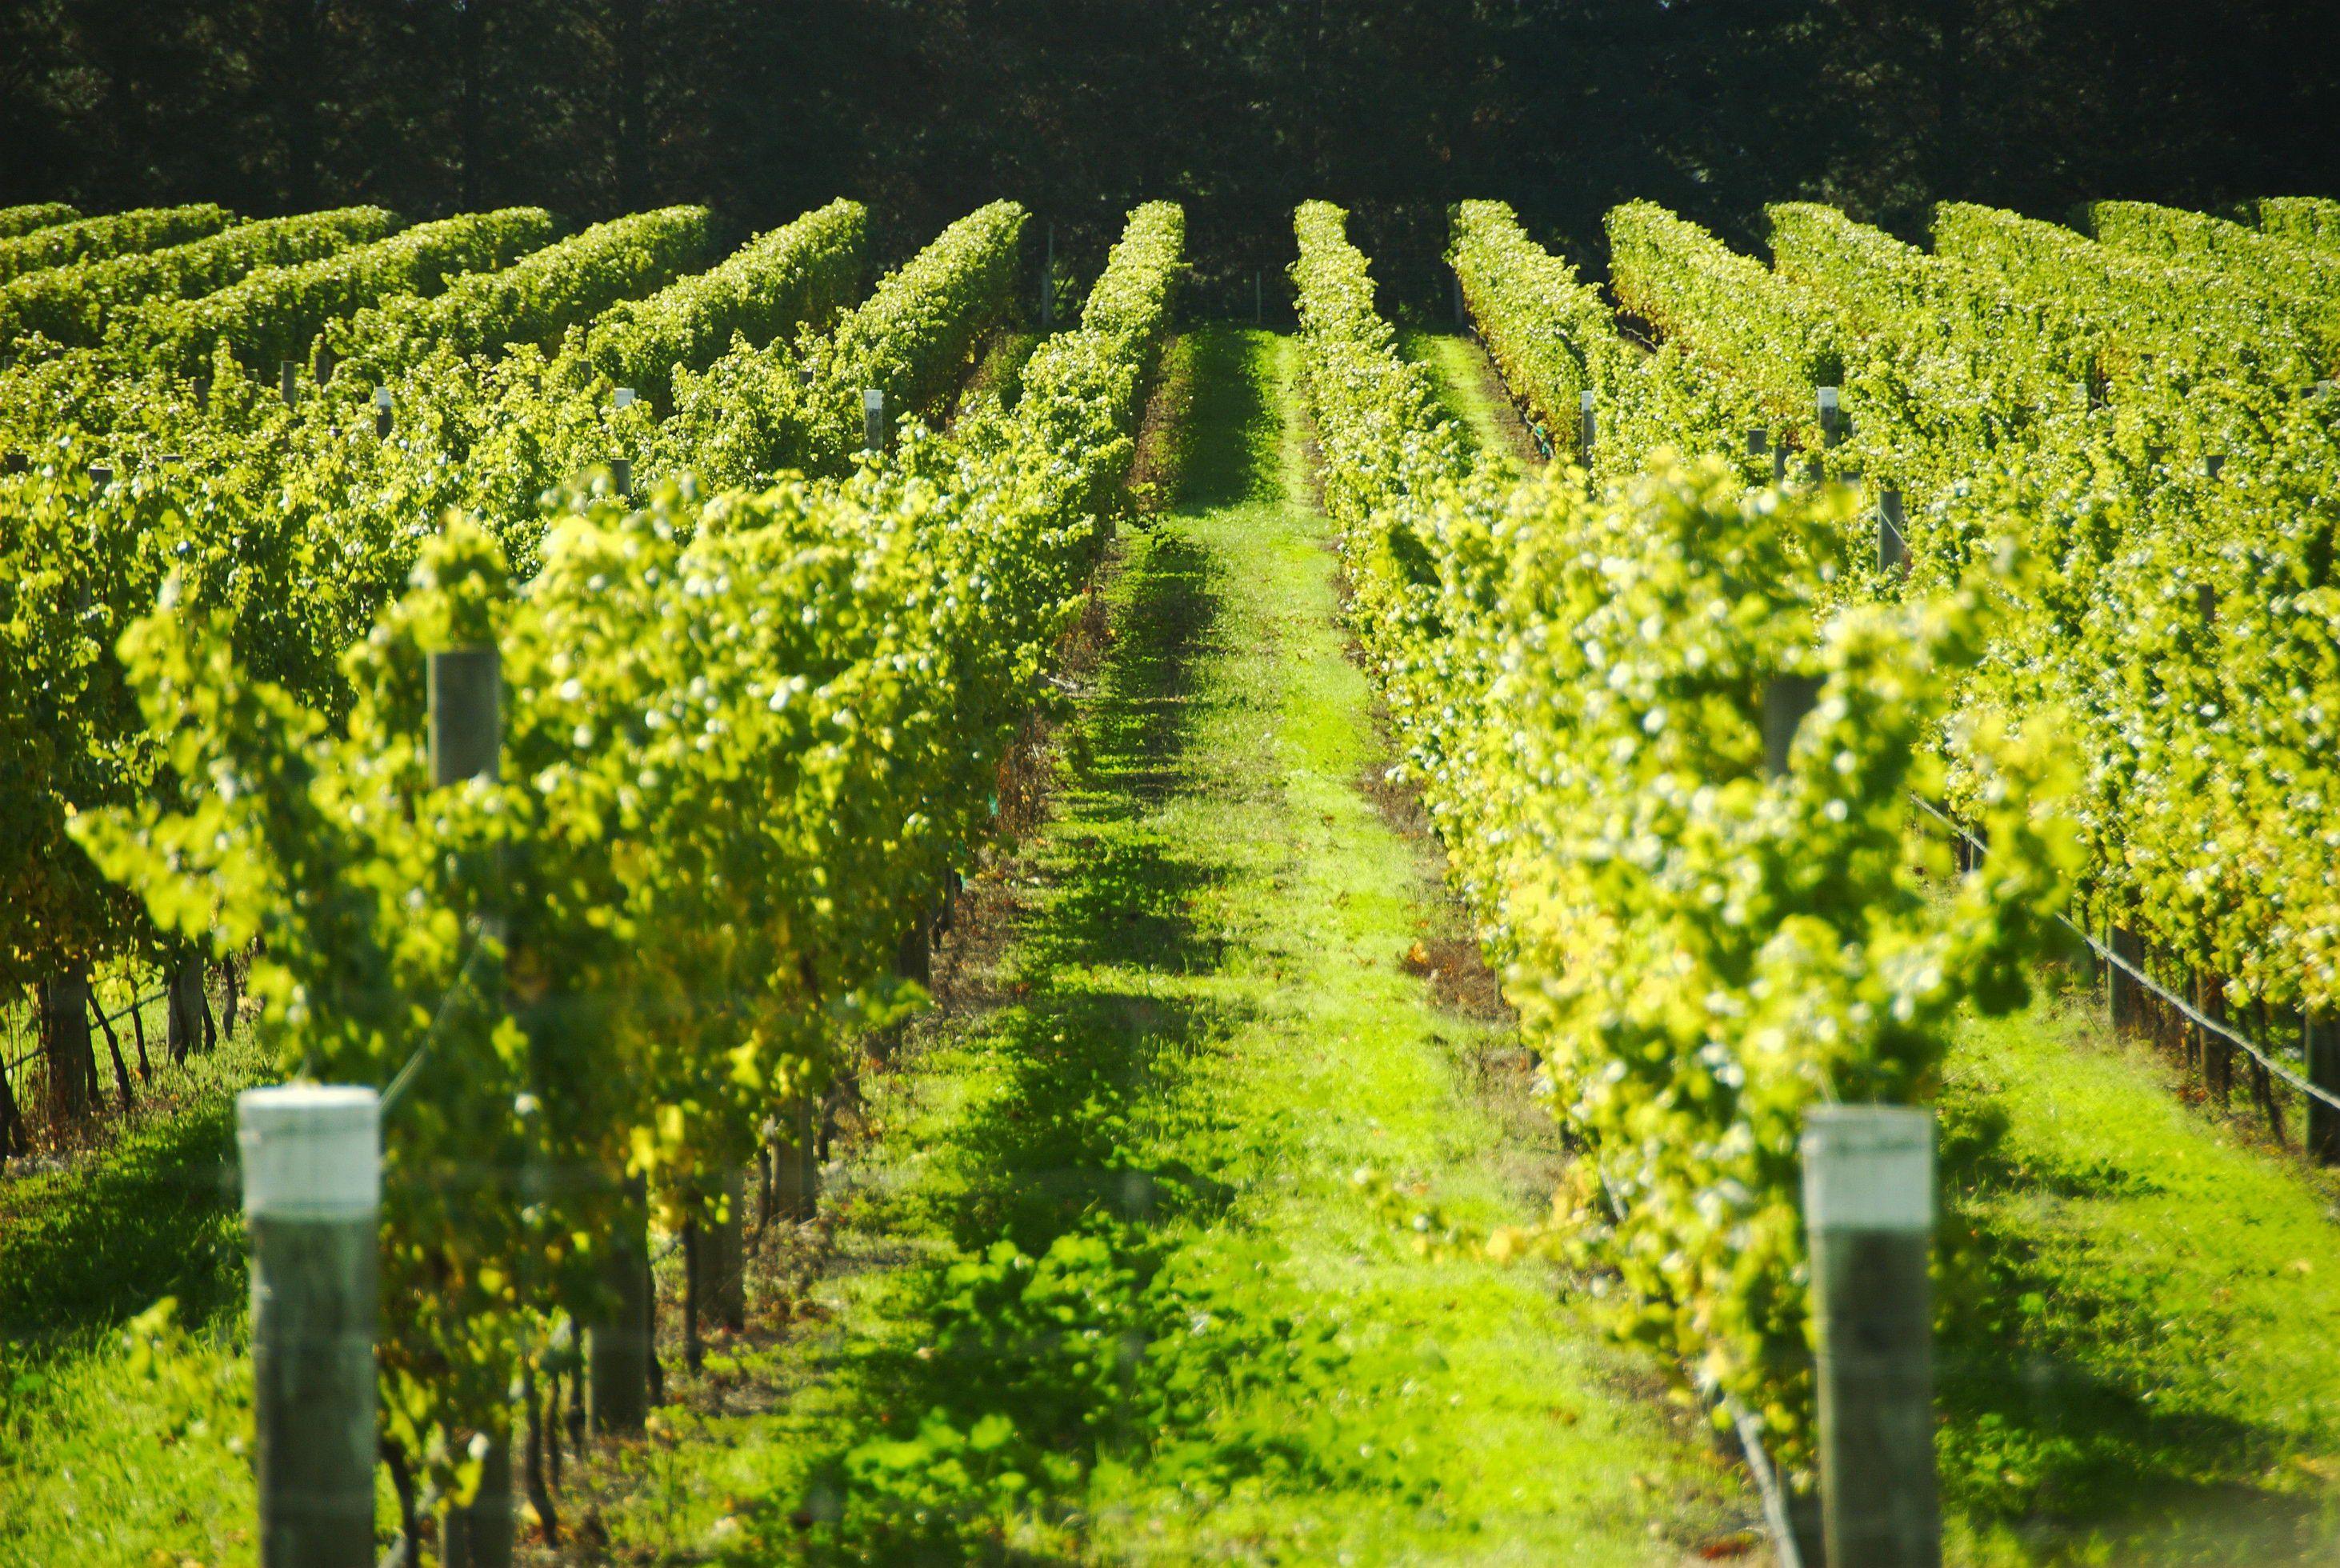 9531_vineyard-fields-france.jpg